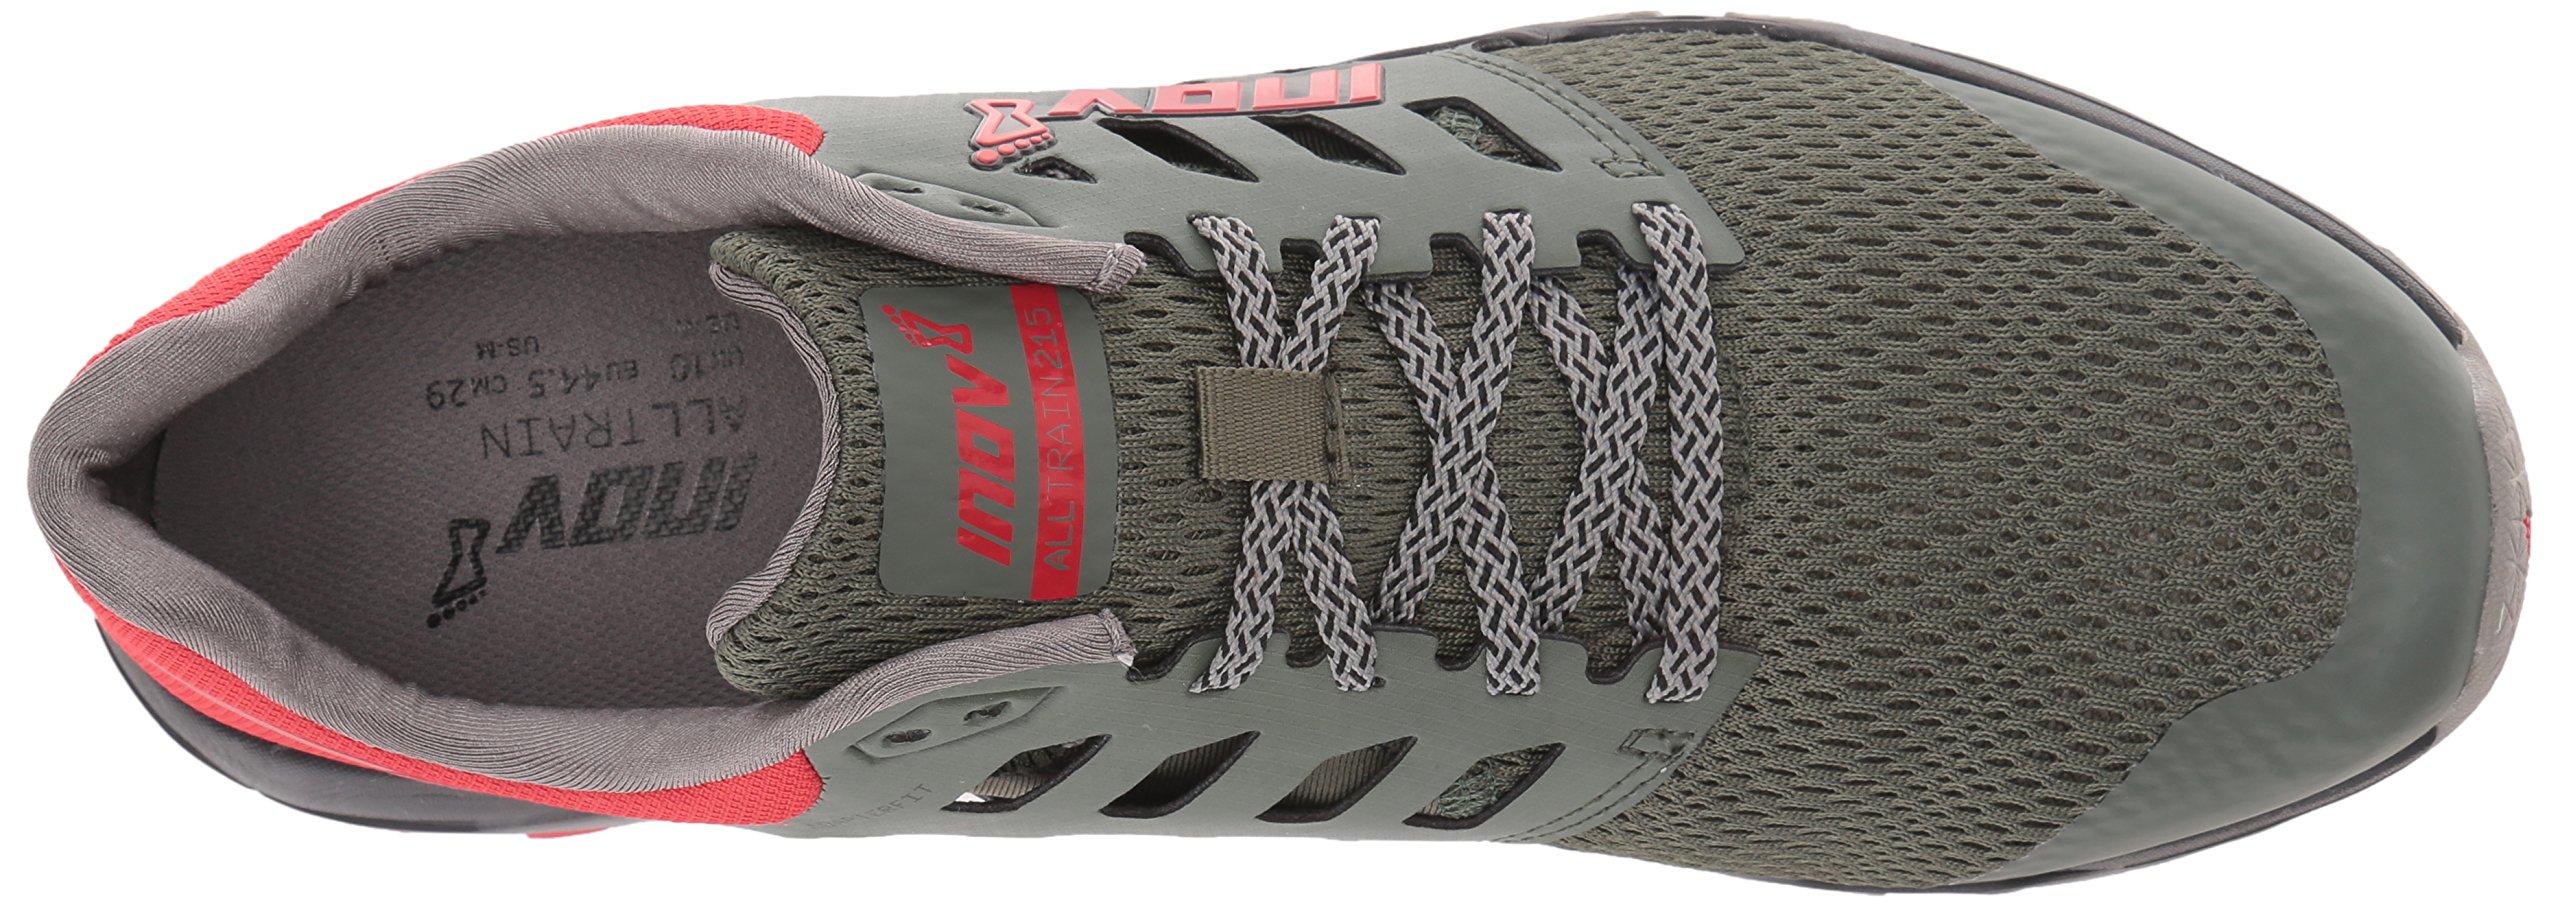 Inov-8 Men's All Train 215 Cross-Trainer Shoe, Dark Green/Red/Black, 12 D US by Inov-8 (Image #8)